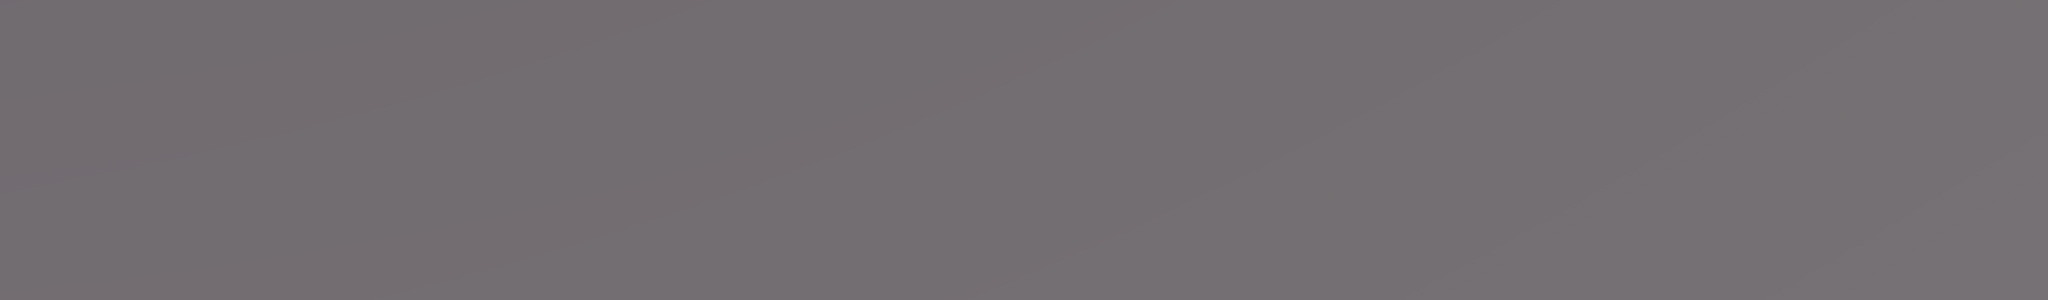 HU 175648 Акрил 3D кромка серая TopX